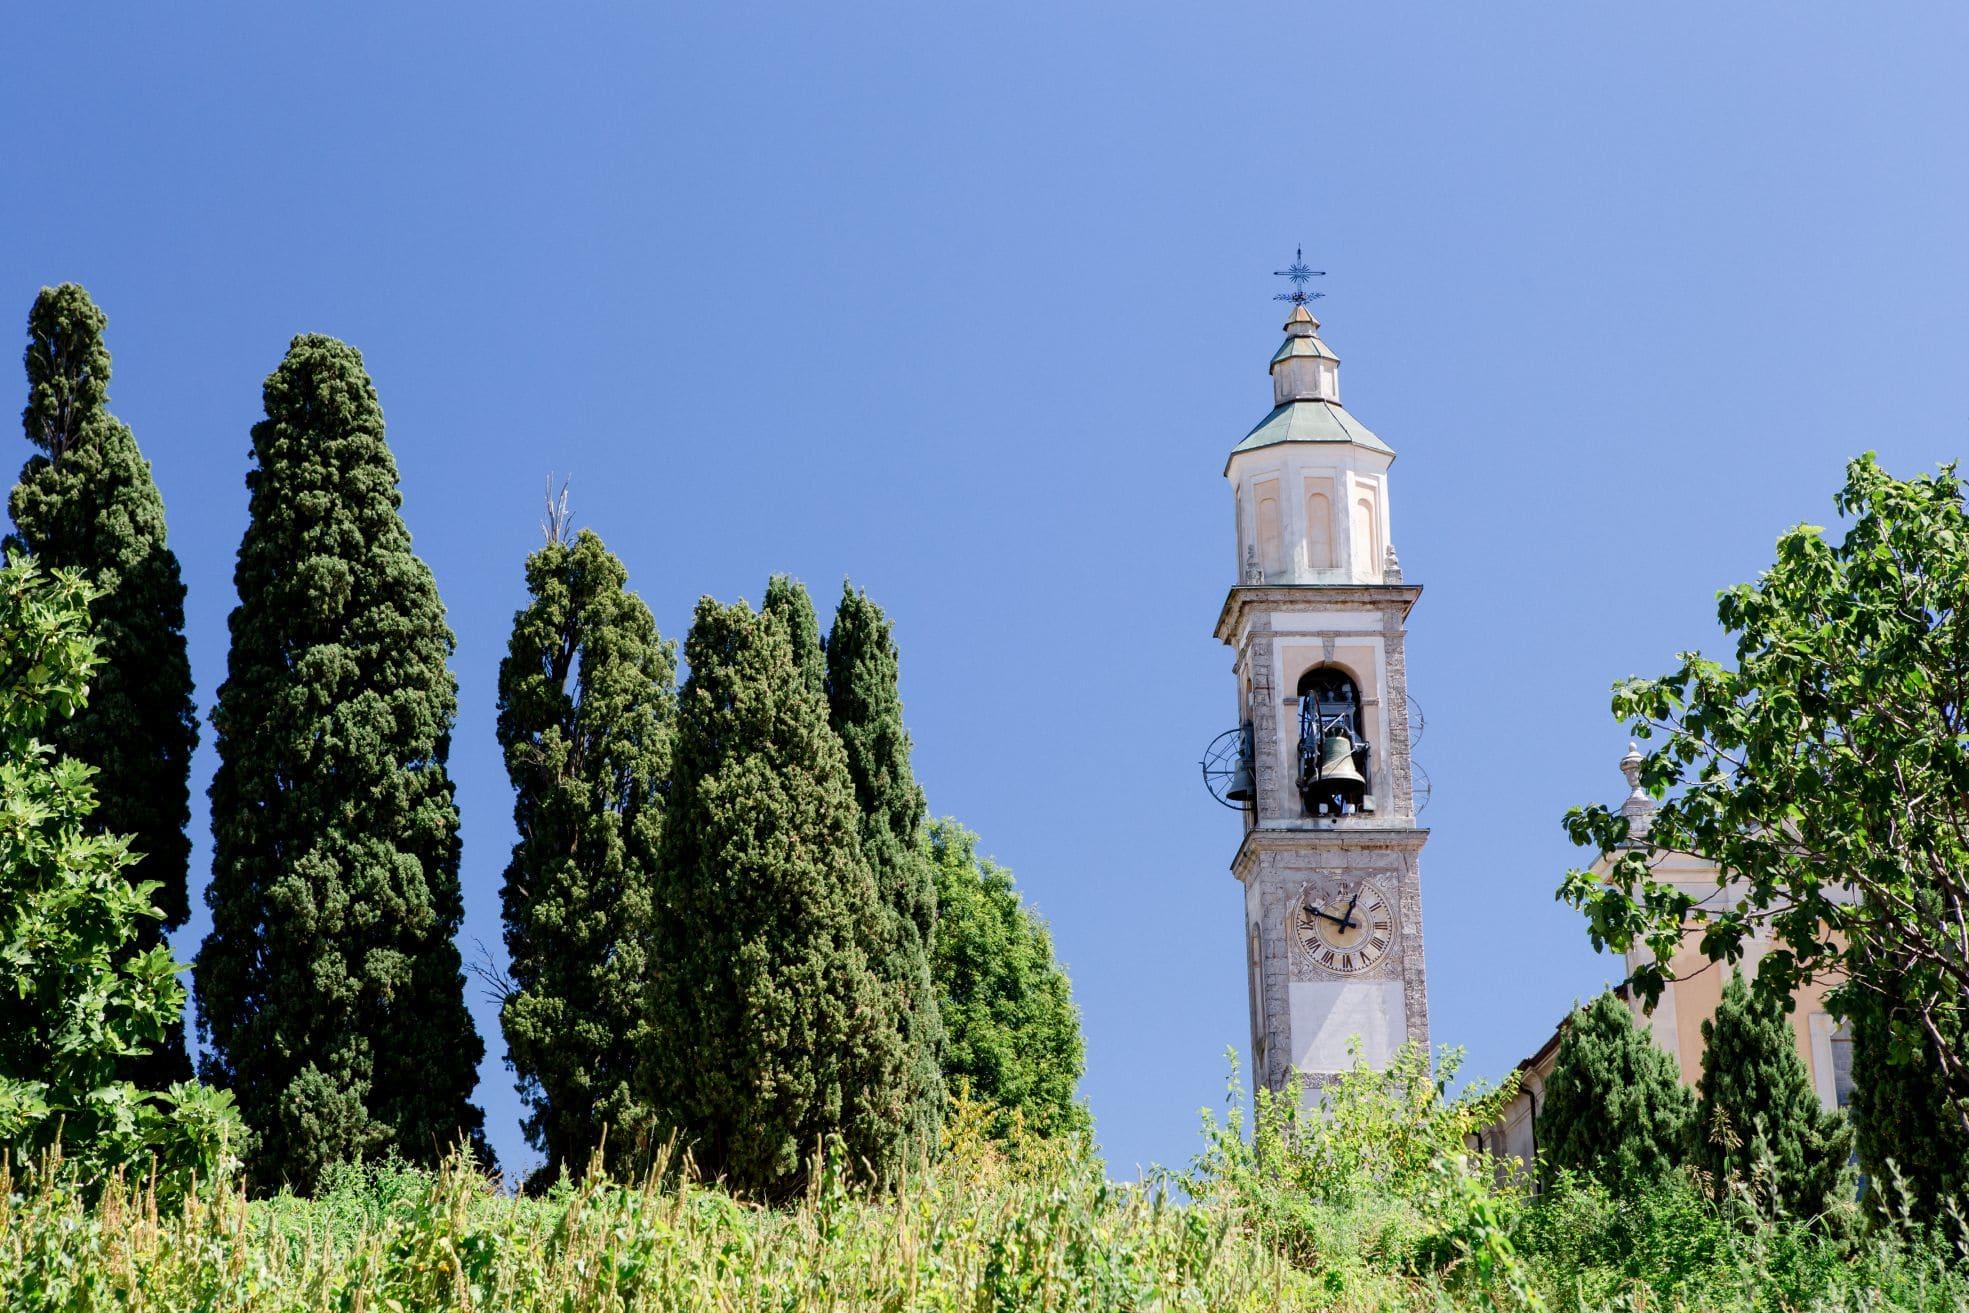 Million Memories_A&D_Hochzeitsfotograf_Schlosshochzeit_Toskana_Lago Di Como_Wedding_Tuscany_068